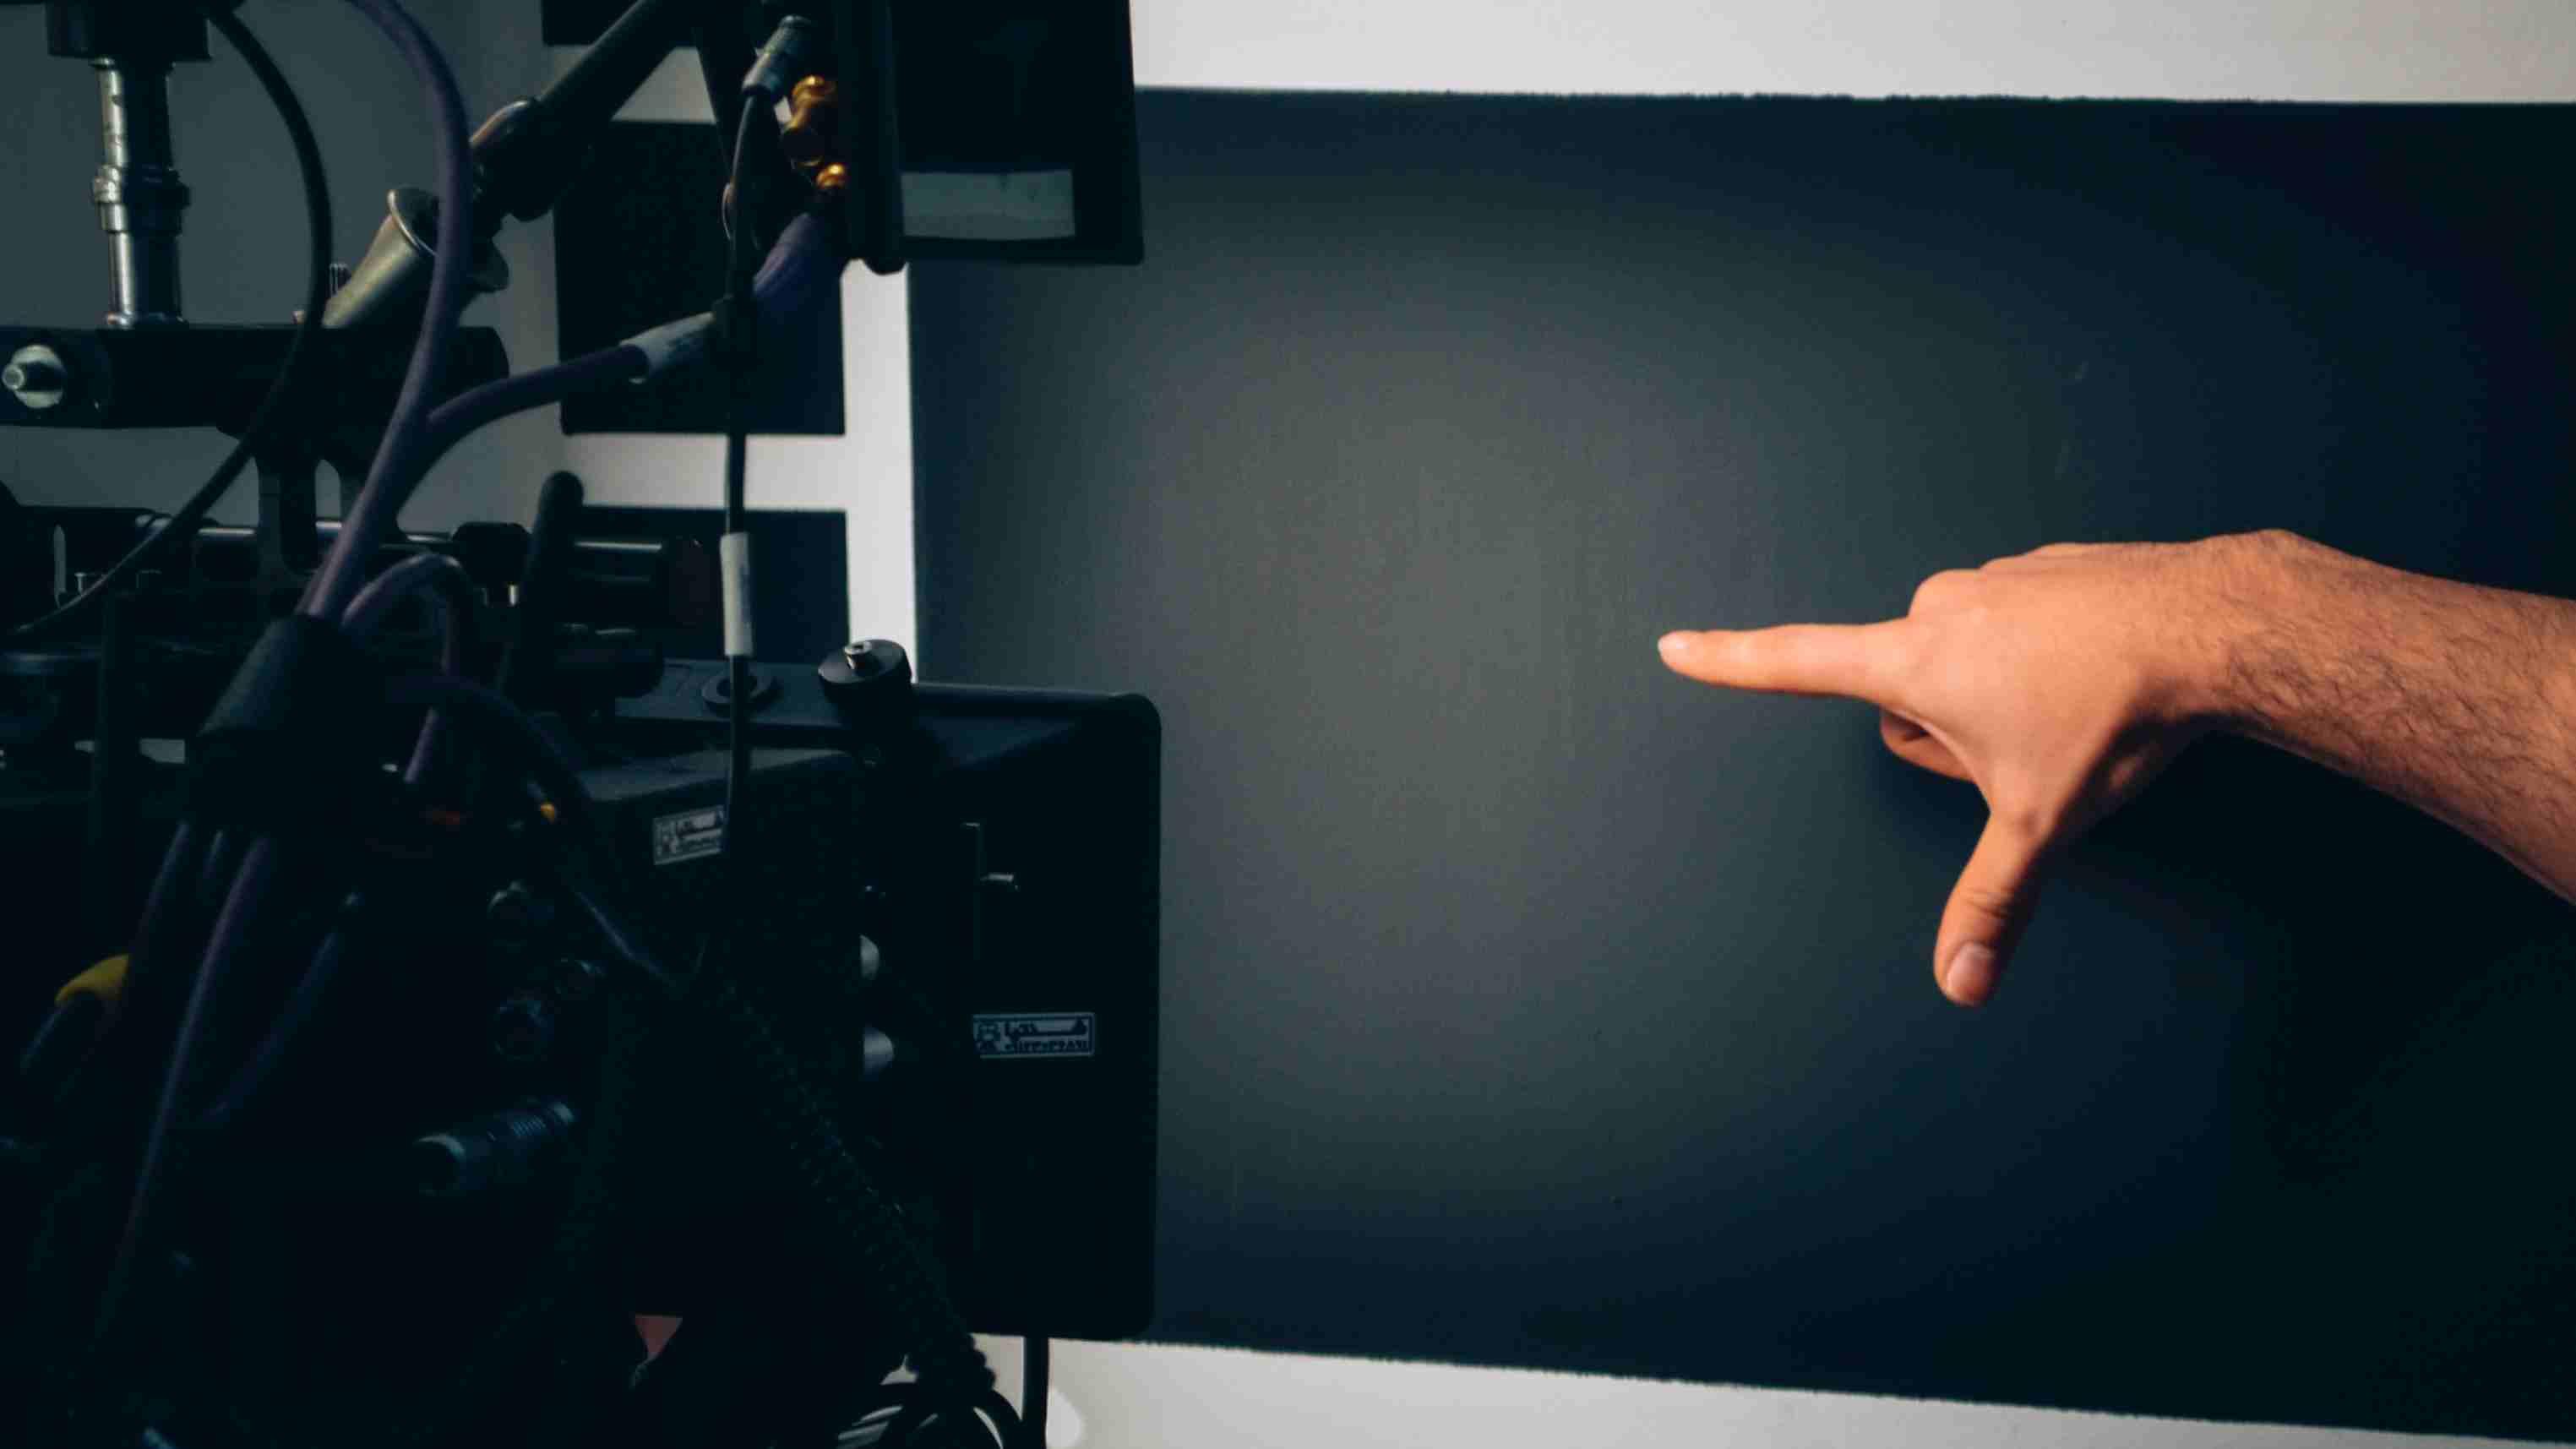 Curso en streaming de Narrativa Audiovisual